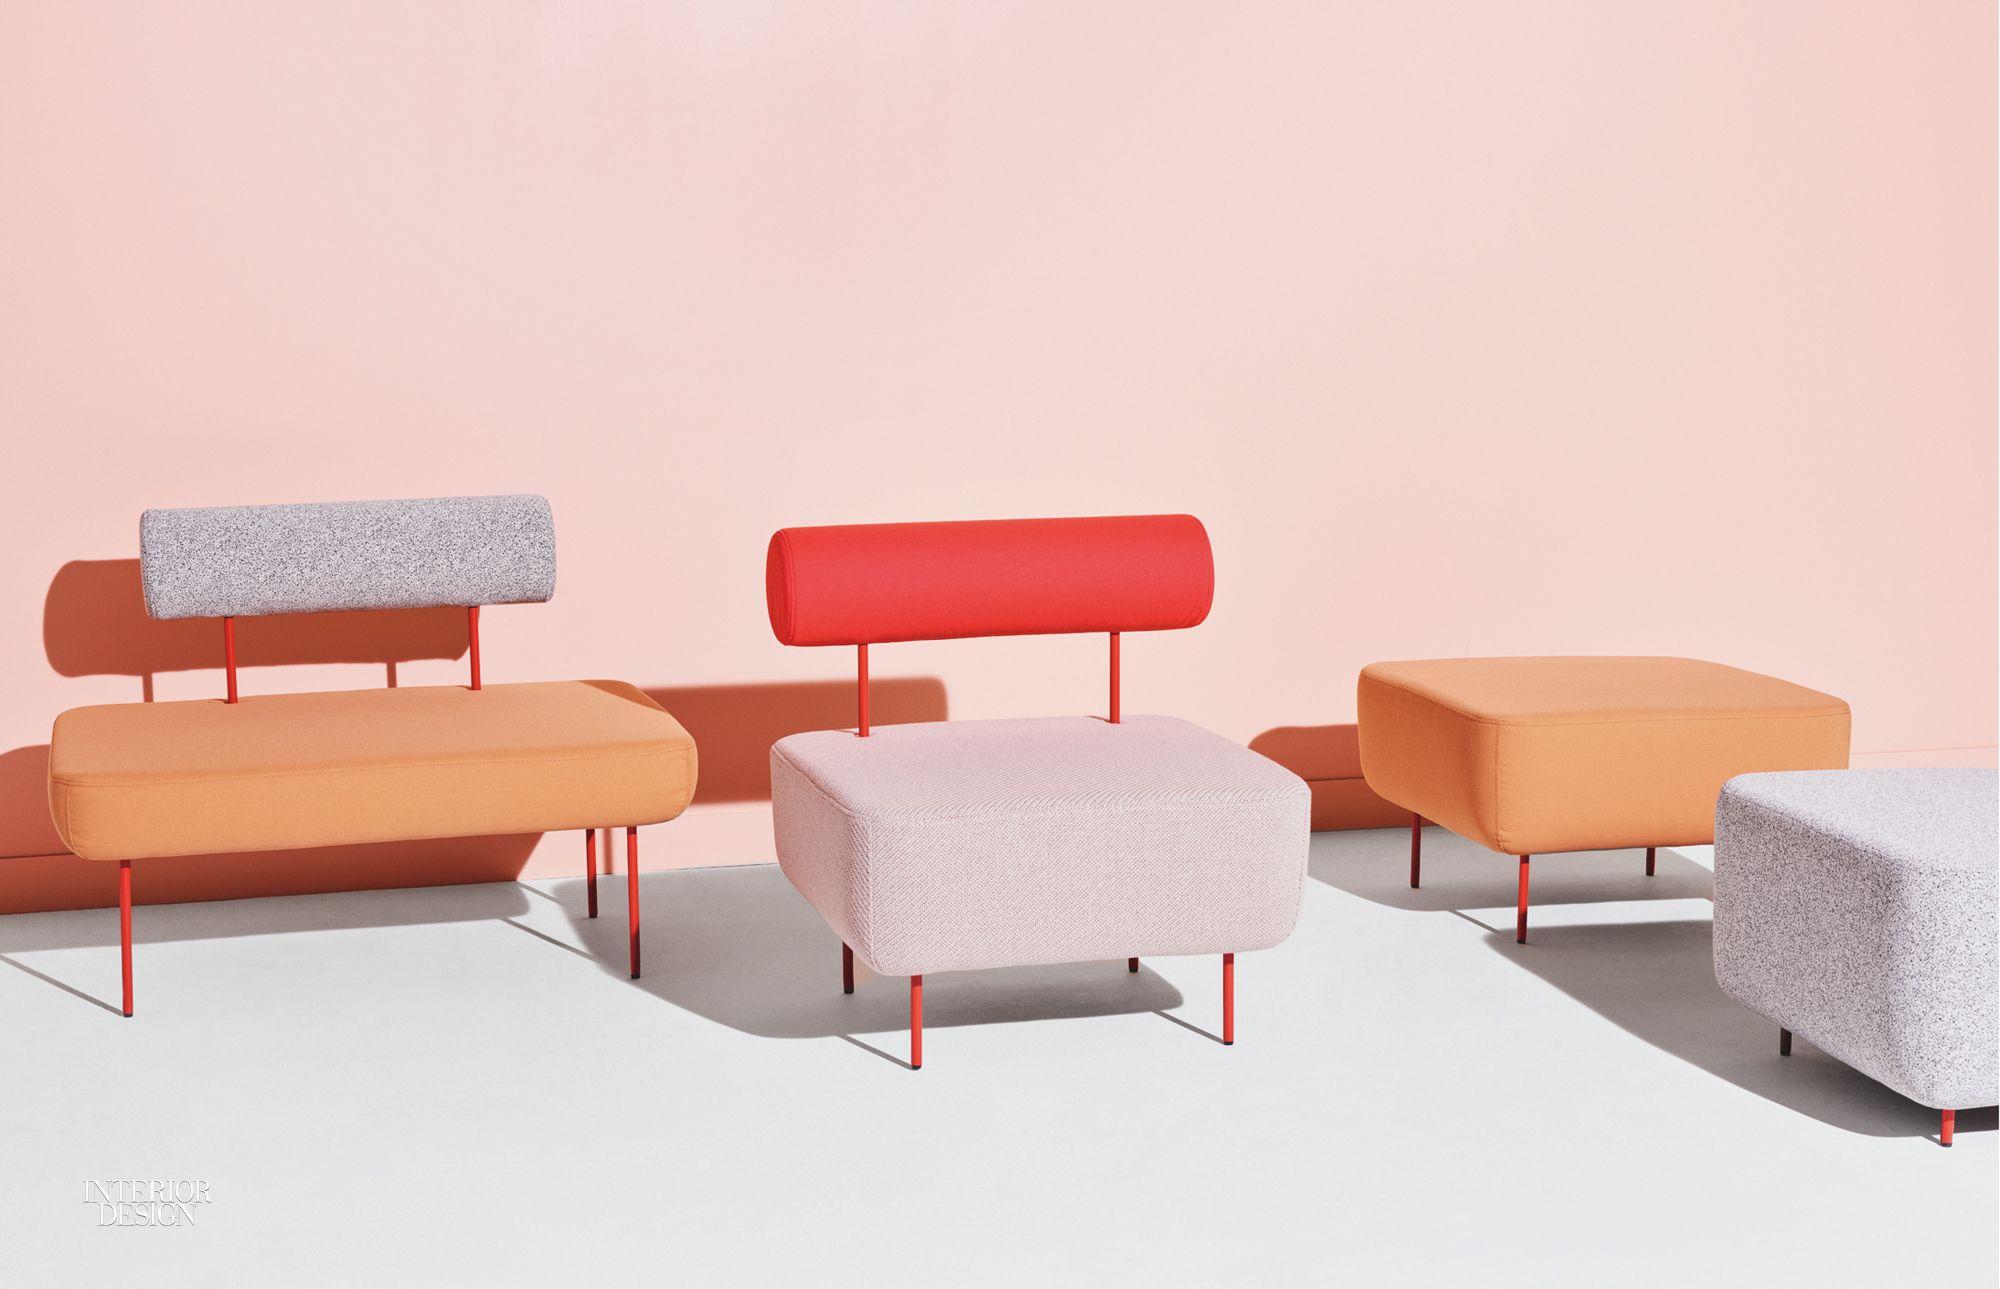 Hoff Modular Furniture By Morten U0026 Jonas, Part Of Villa P.F. By Petite  Friture. Photography By Photo Florent Tanet. Set Design By Ella Perdereau.